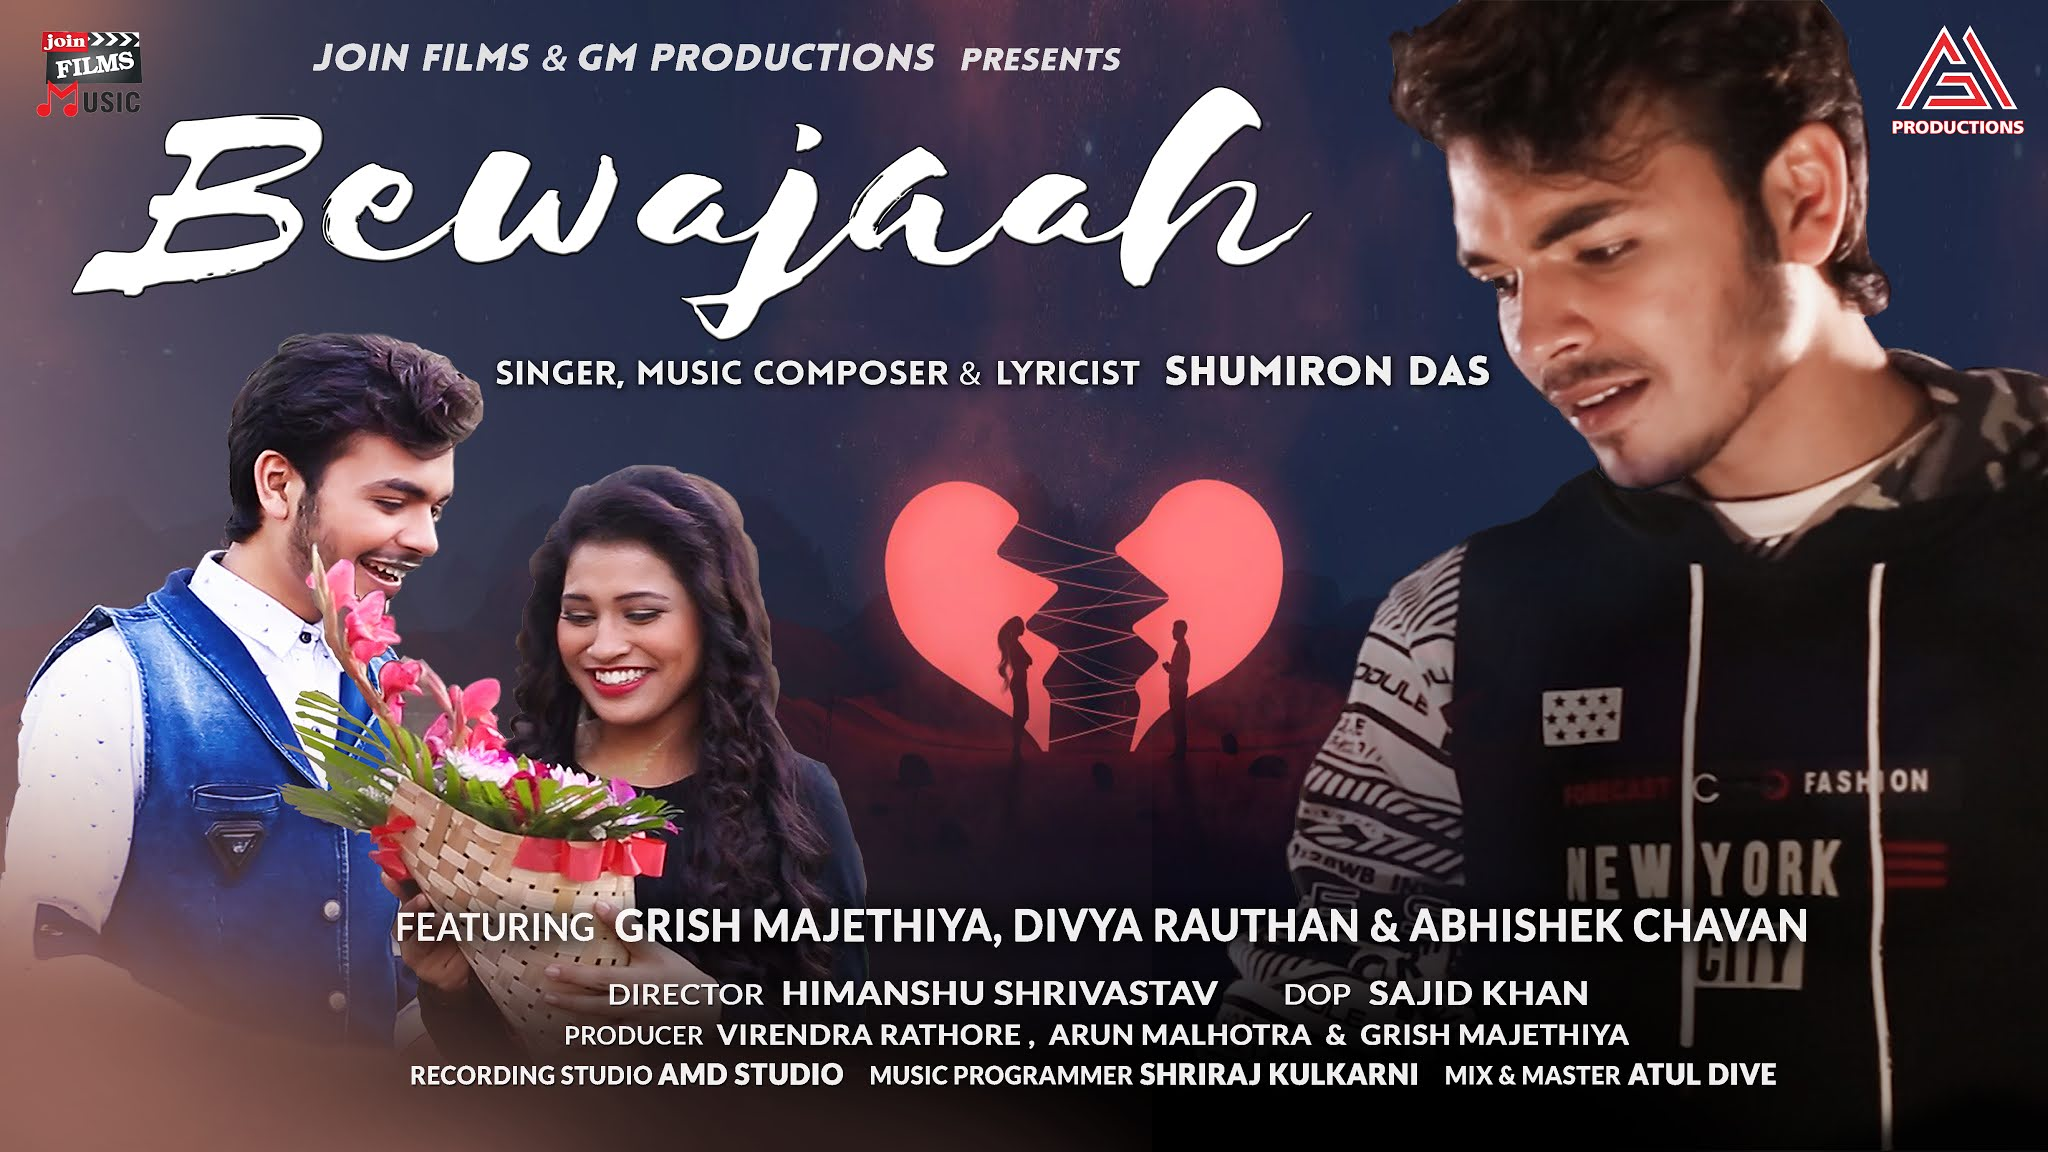 Bewajaah-Song-Shumiron-Das's-First-Original-Song-Bewajaah-Released-featuring-actor-Grish-Majethiya